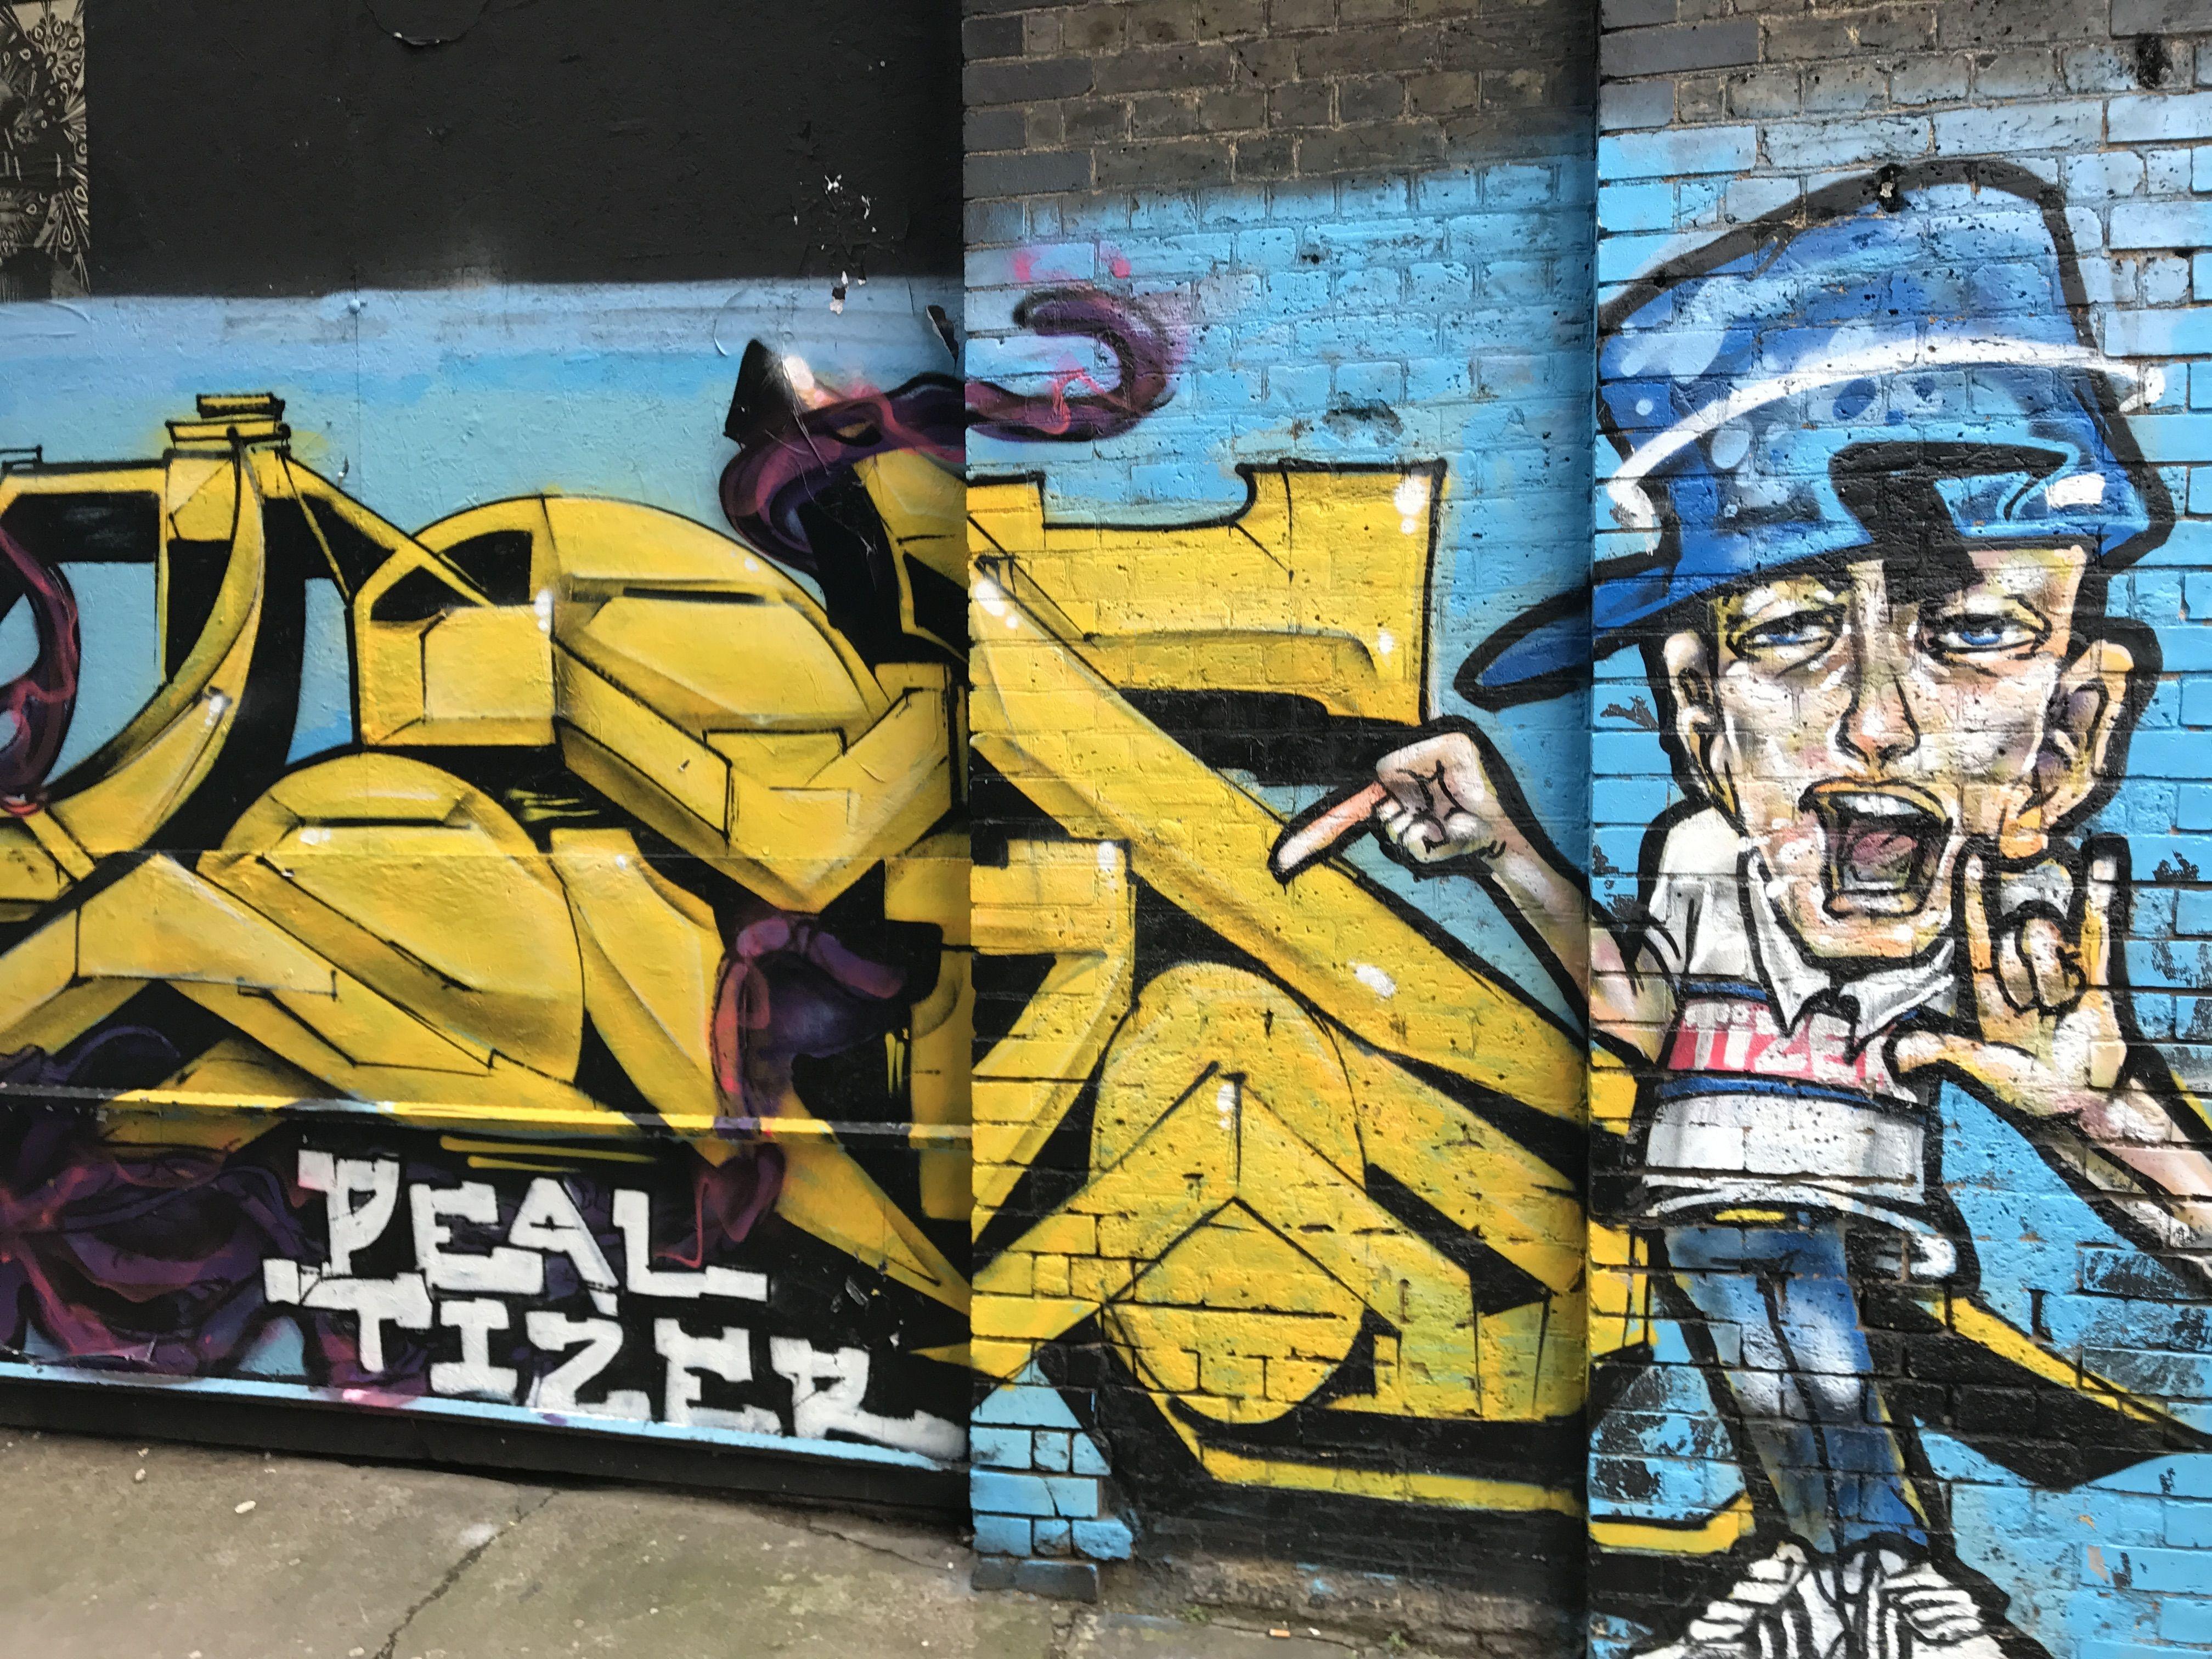 Pin by Fanaro on хлам | Pinterest | Street art and Graffiti